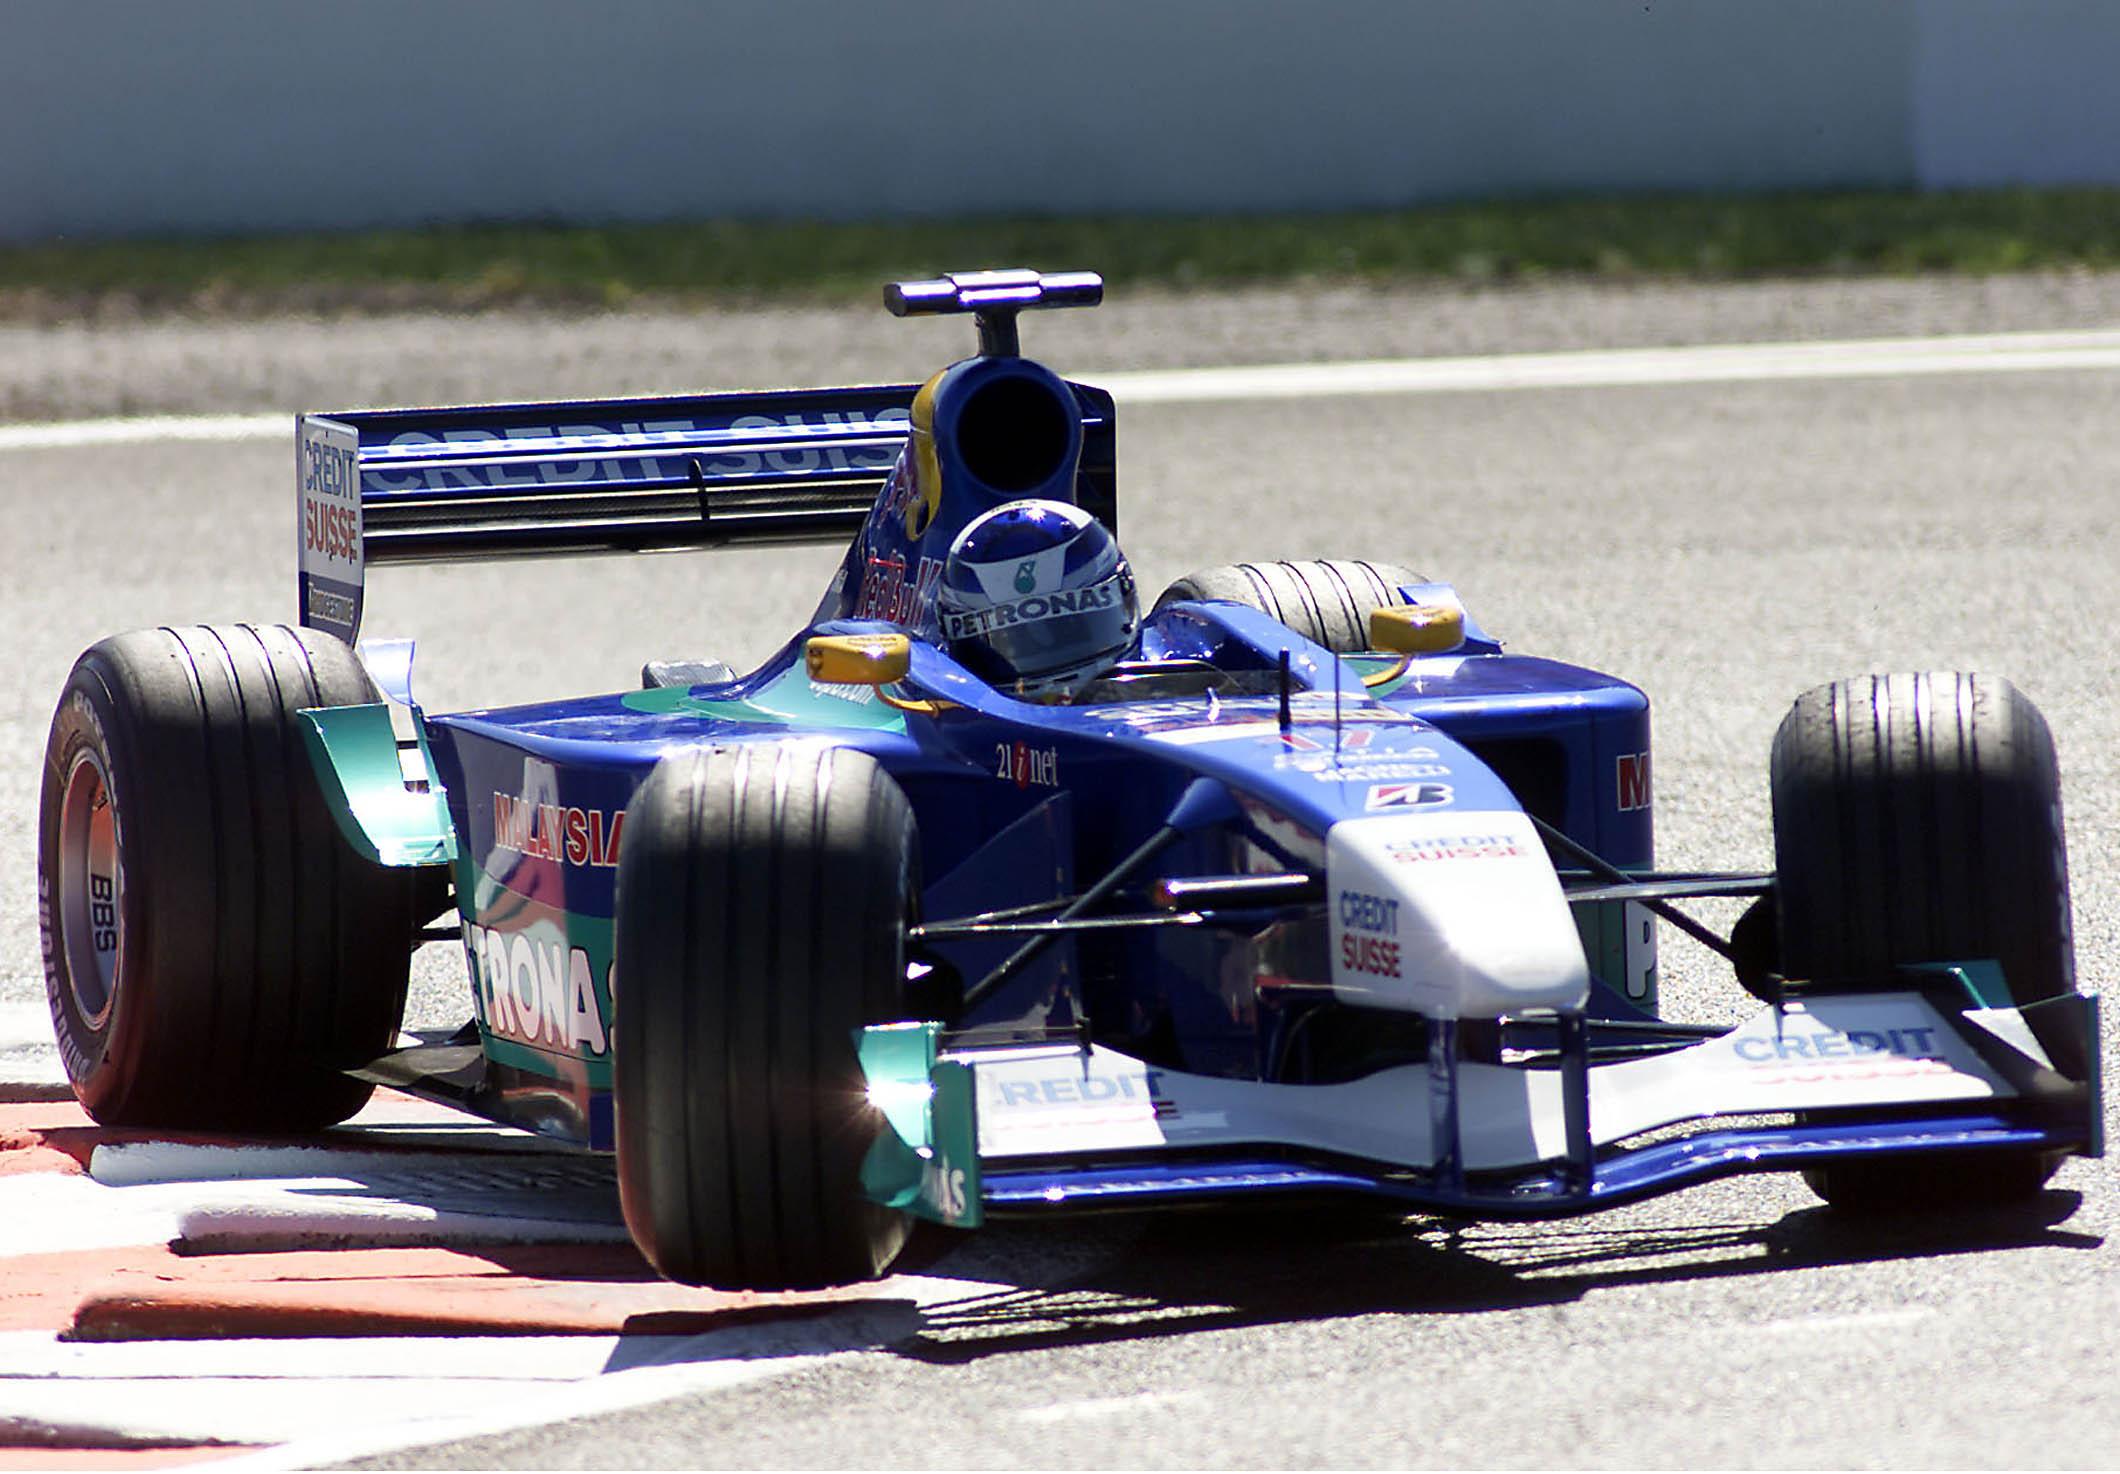 Kimi Raikkonen, Sauber, F1